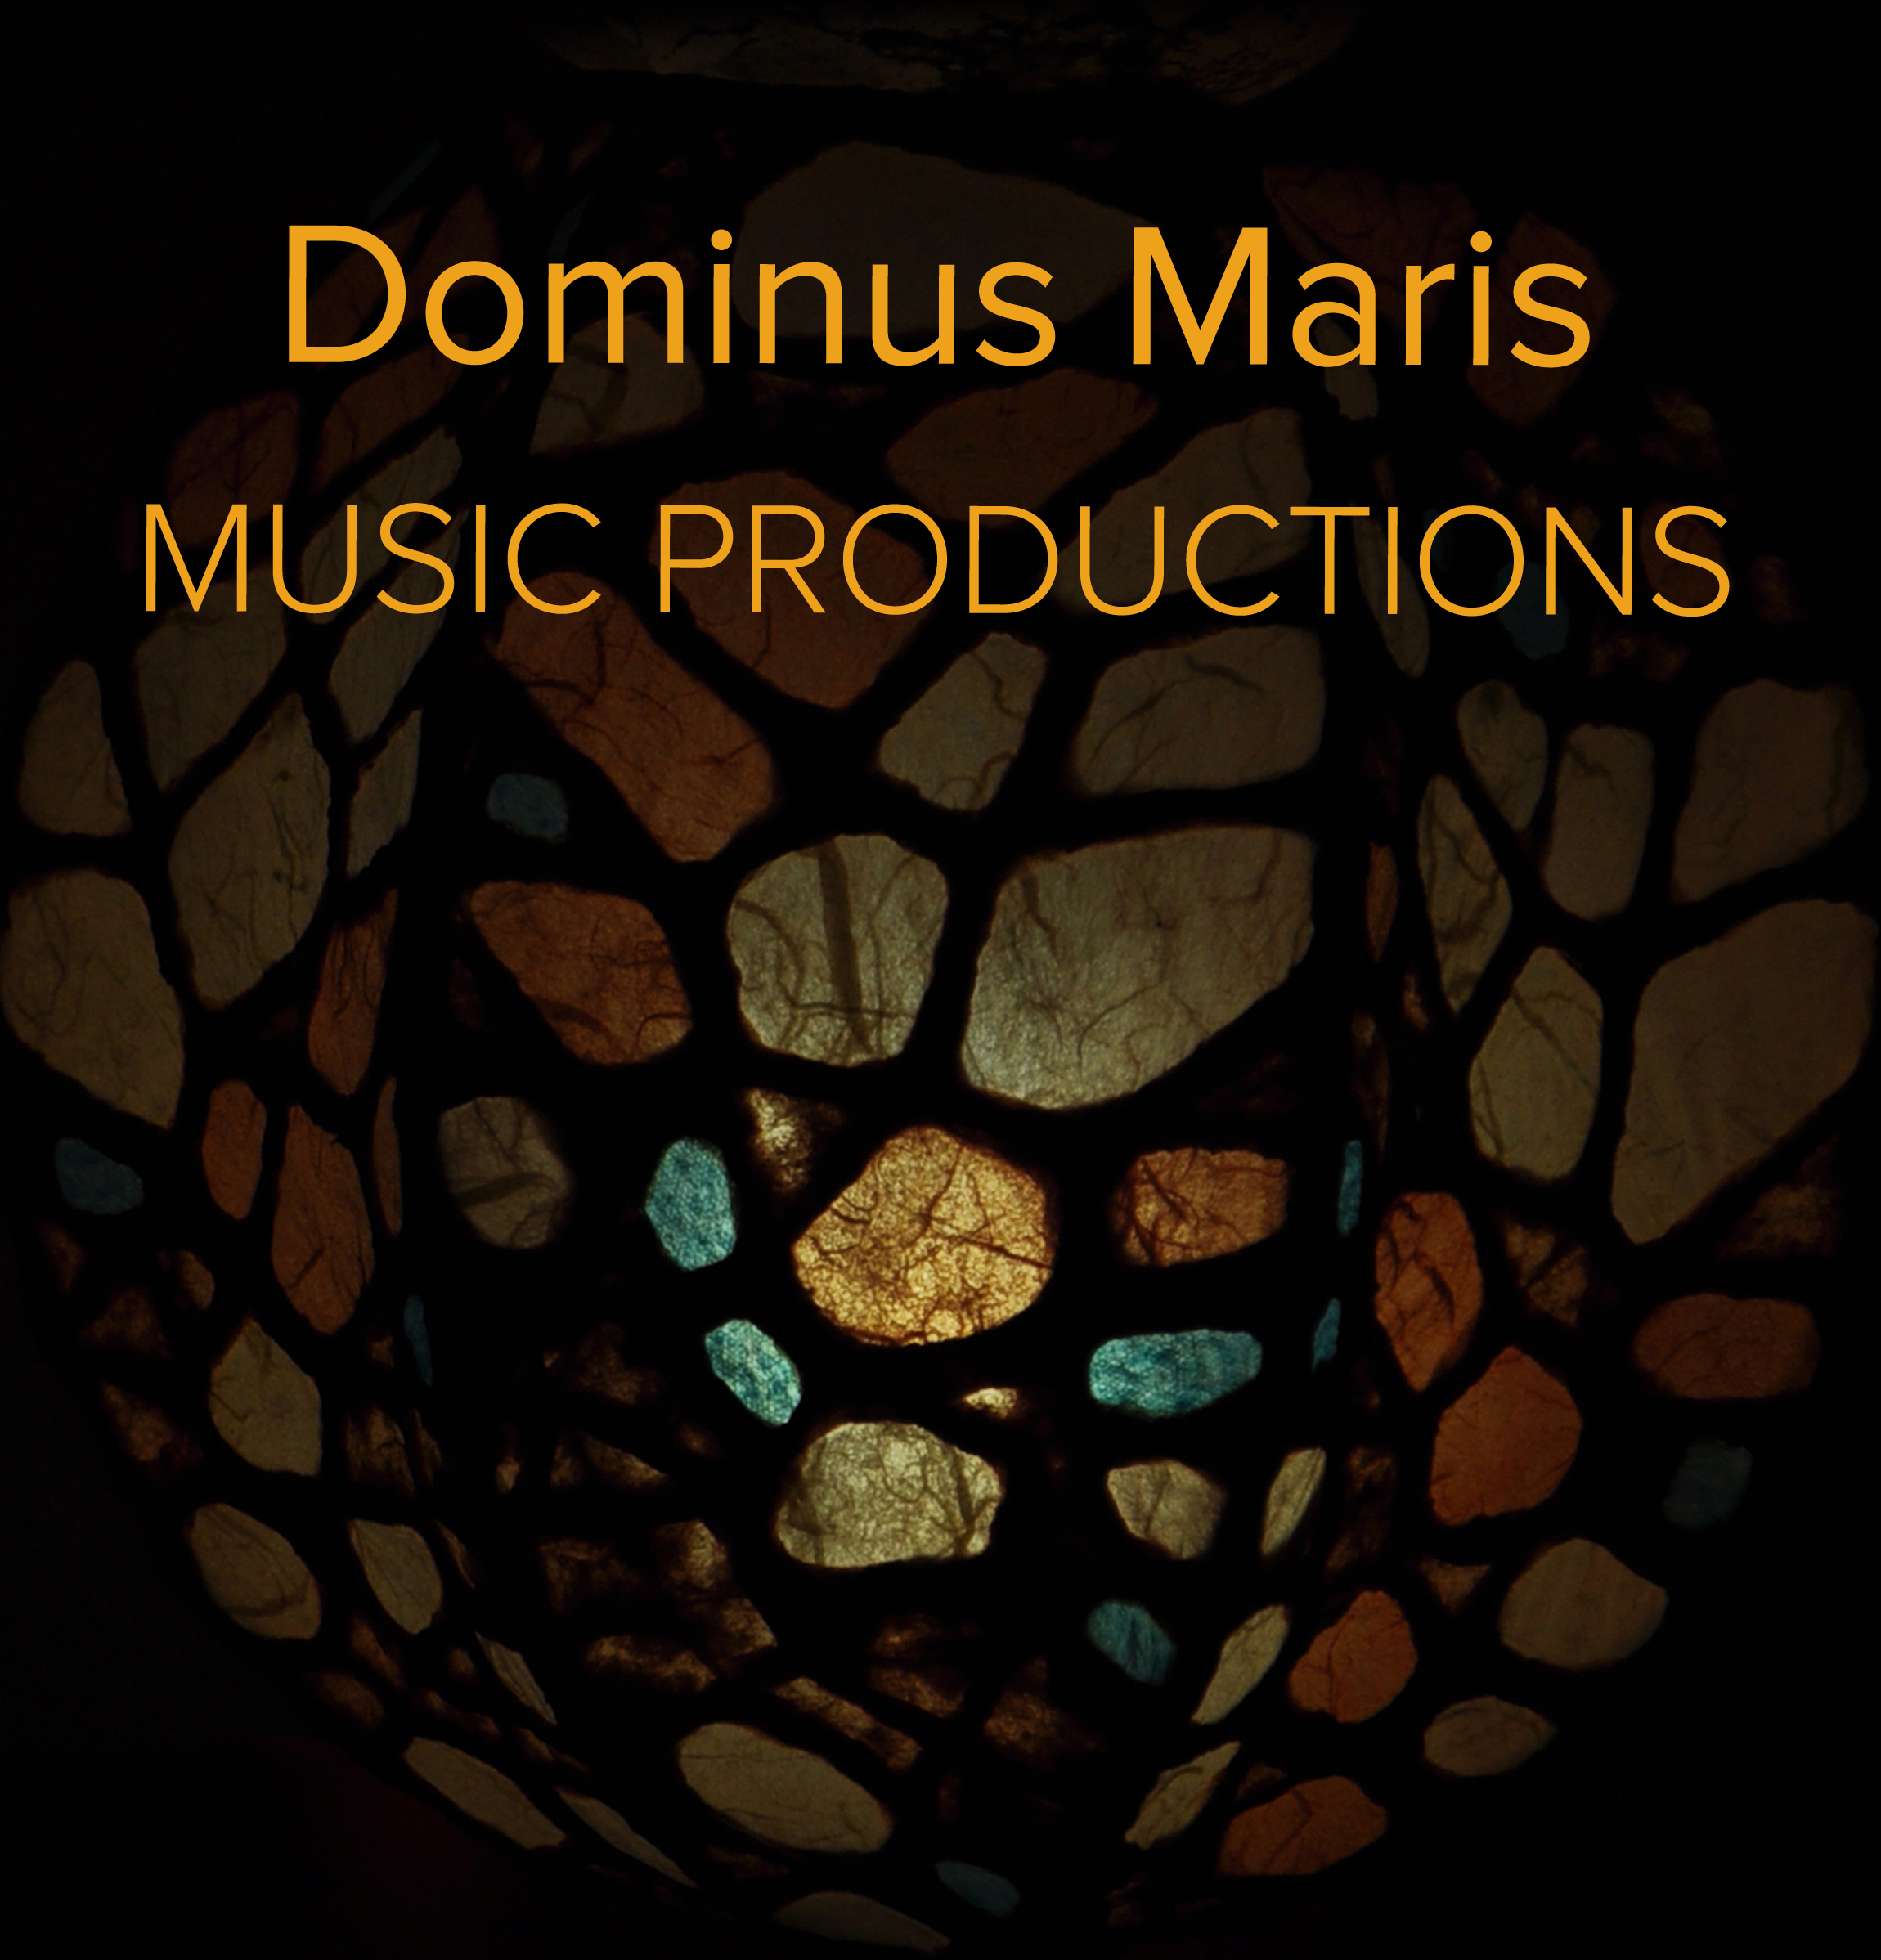 Dominus-Maris-Music-Productions-Detmar-Leertouwer-www.Dominusmaris-MusicProductions.com